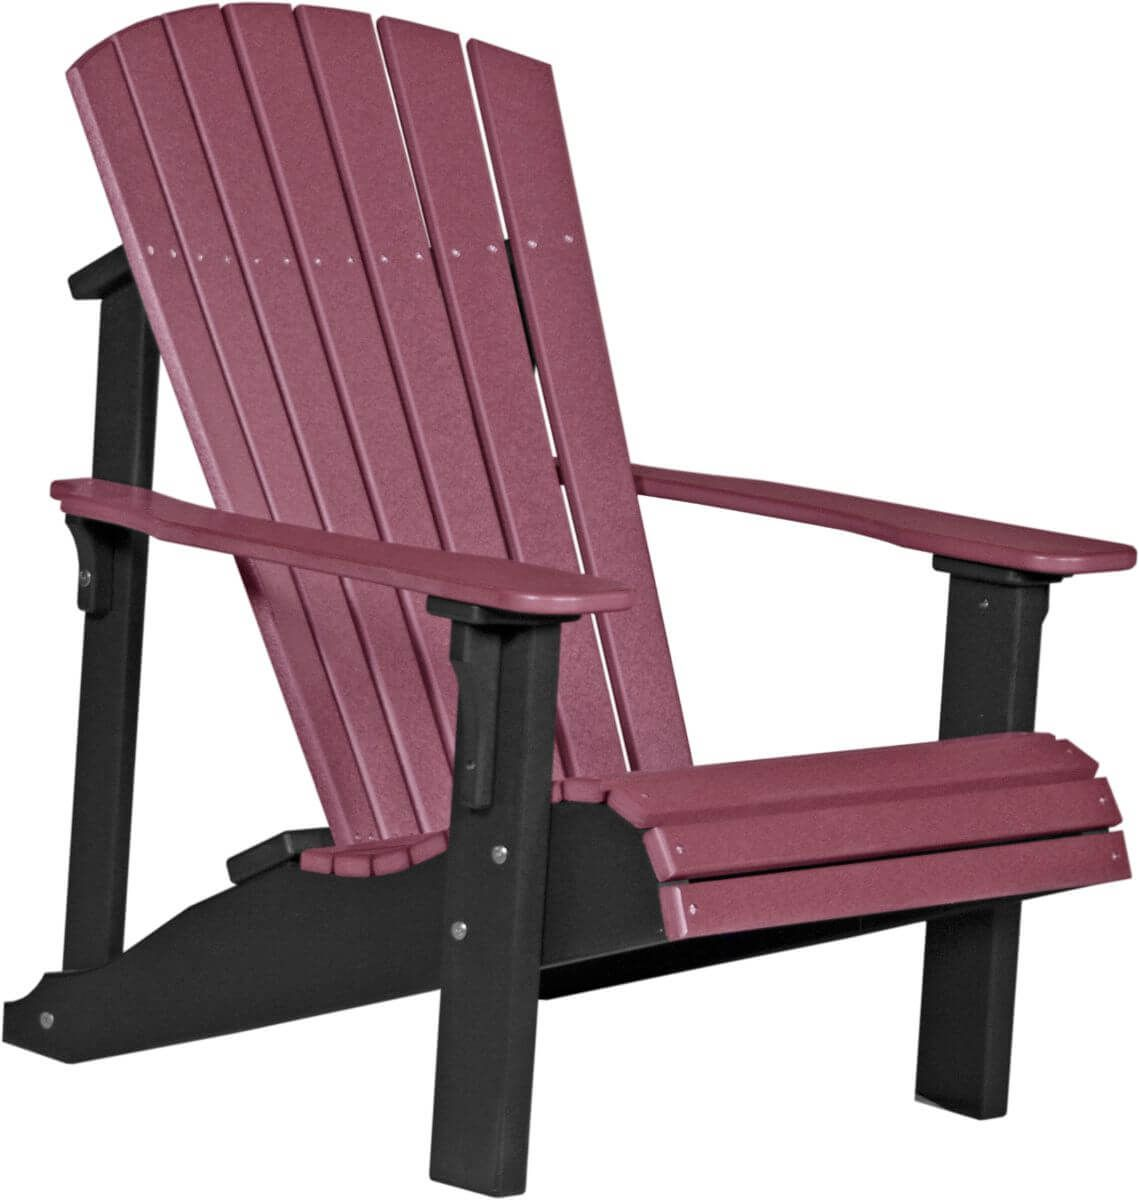 Cherrywood and Black Rockaway Adirondack Chair